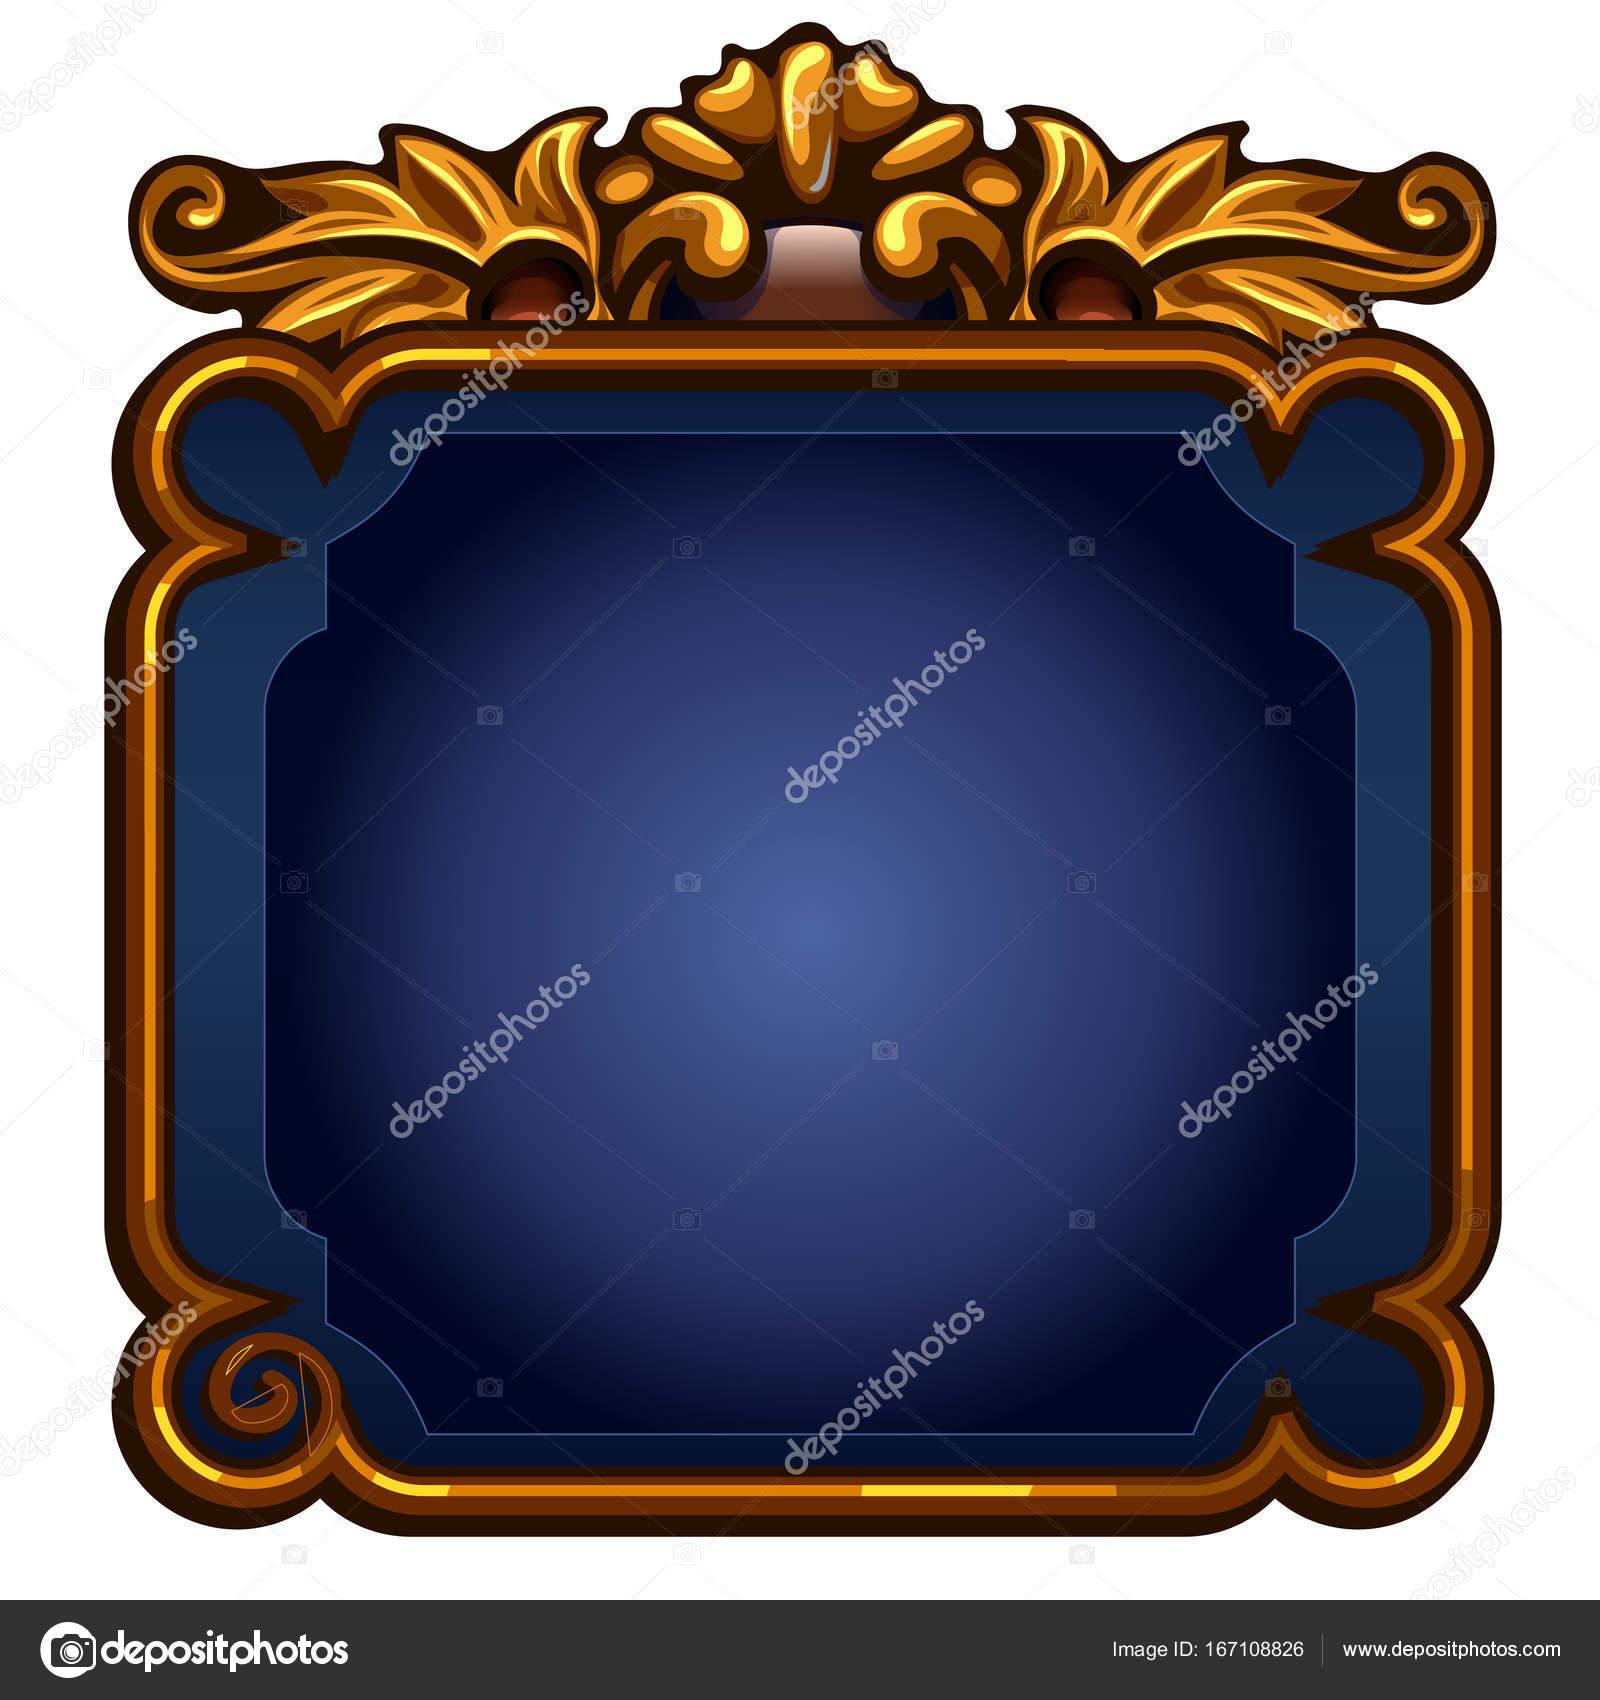 Juego pantalla azul con marco de oro. Ilustración de vector sobre ...